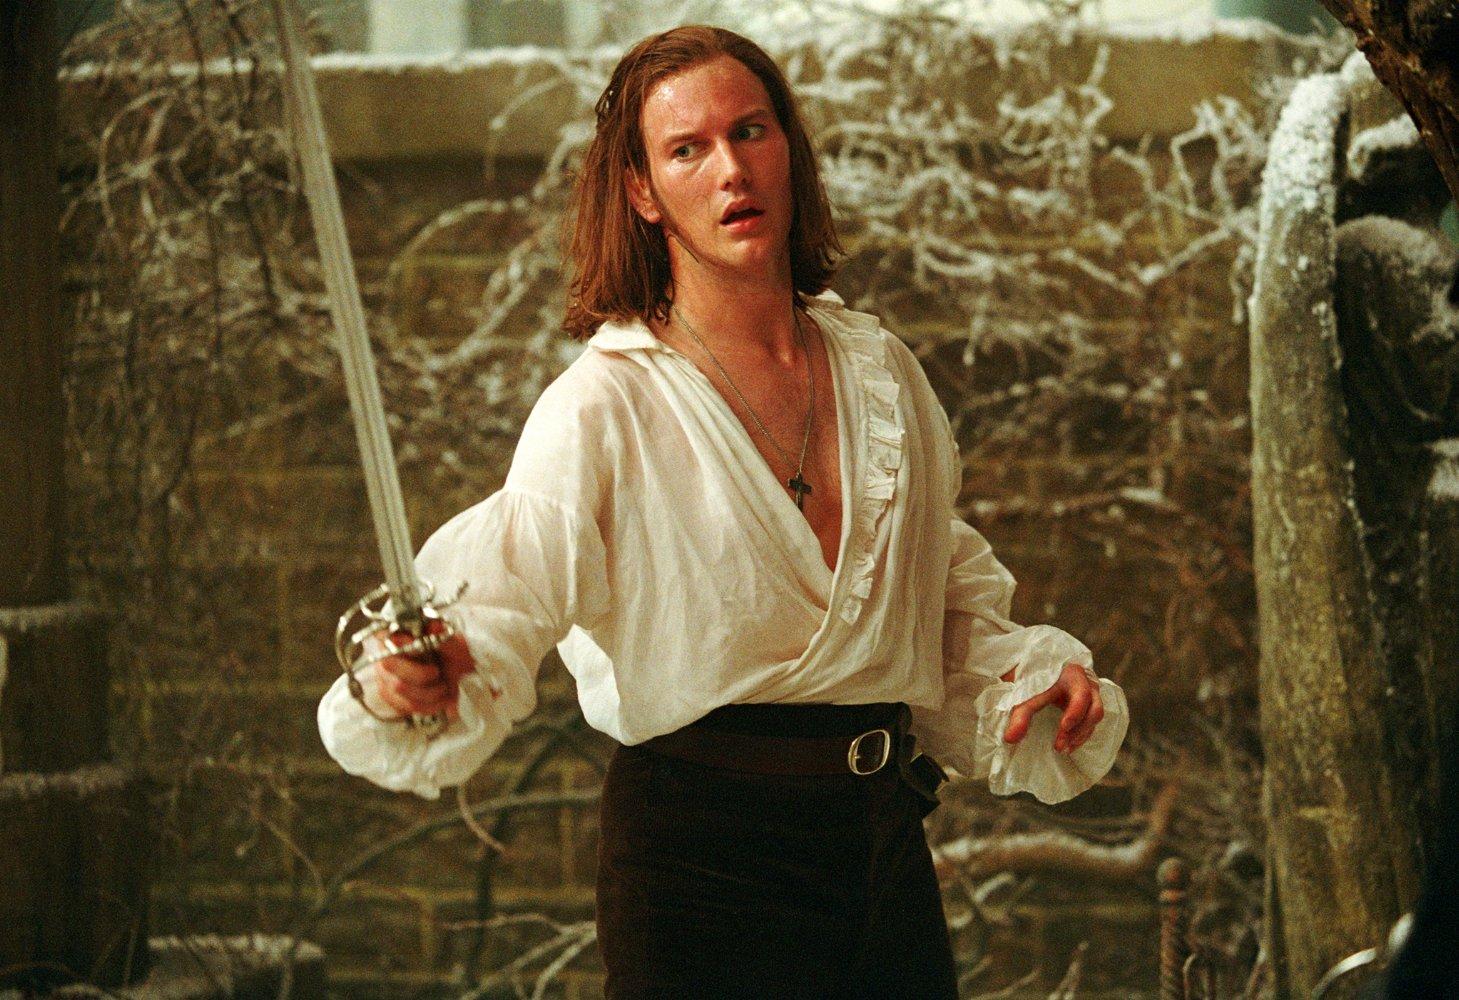 Patrick Wilson as Viscomte Raoul de Chagny in The Phantom of the Opera (2004)